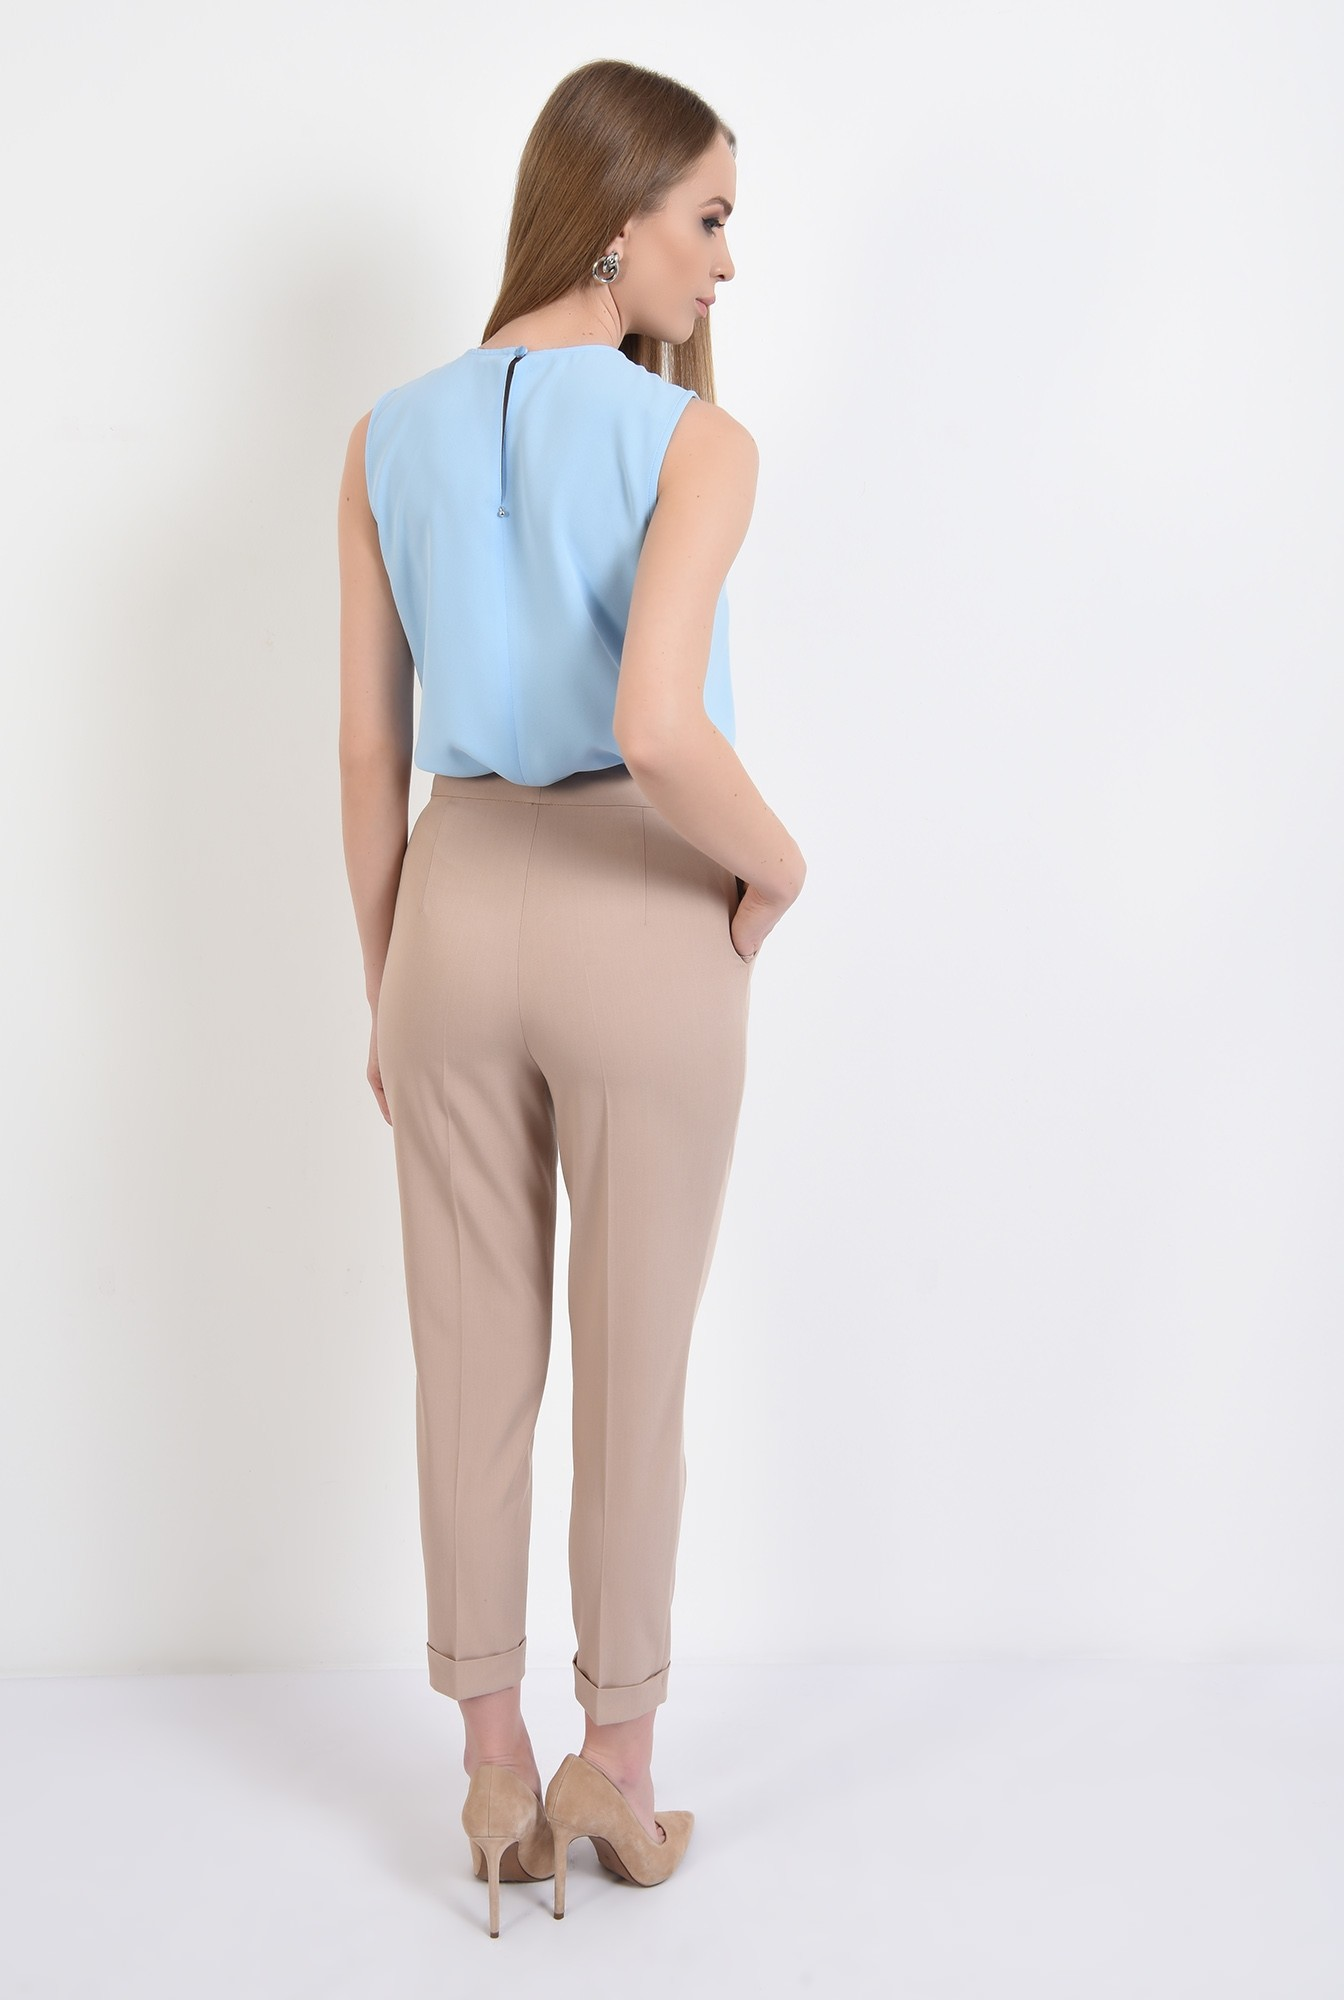 1 - bluza bleu, fara maneci, cu funde negre, bluza office